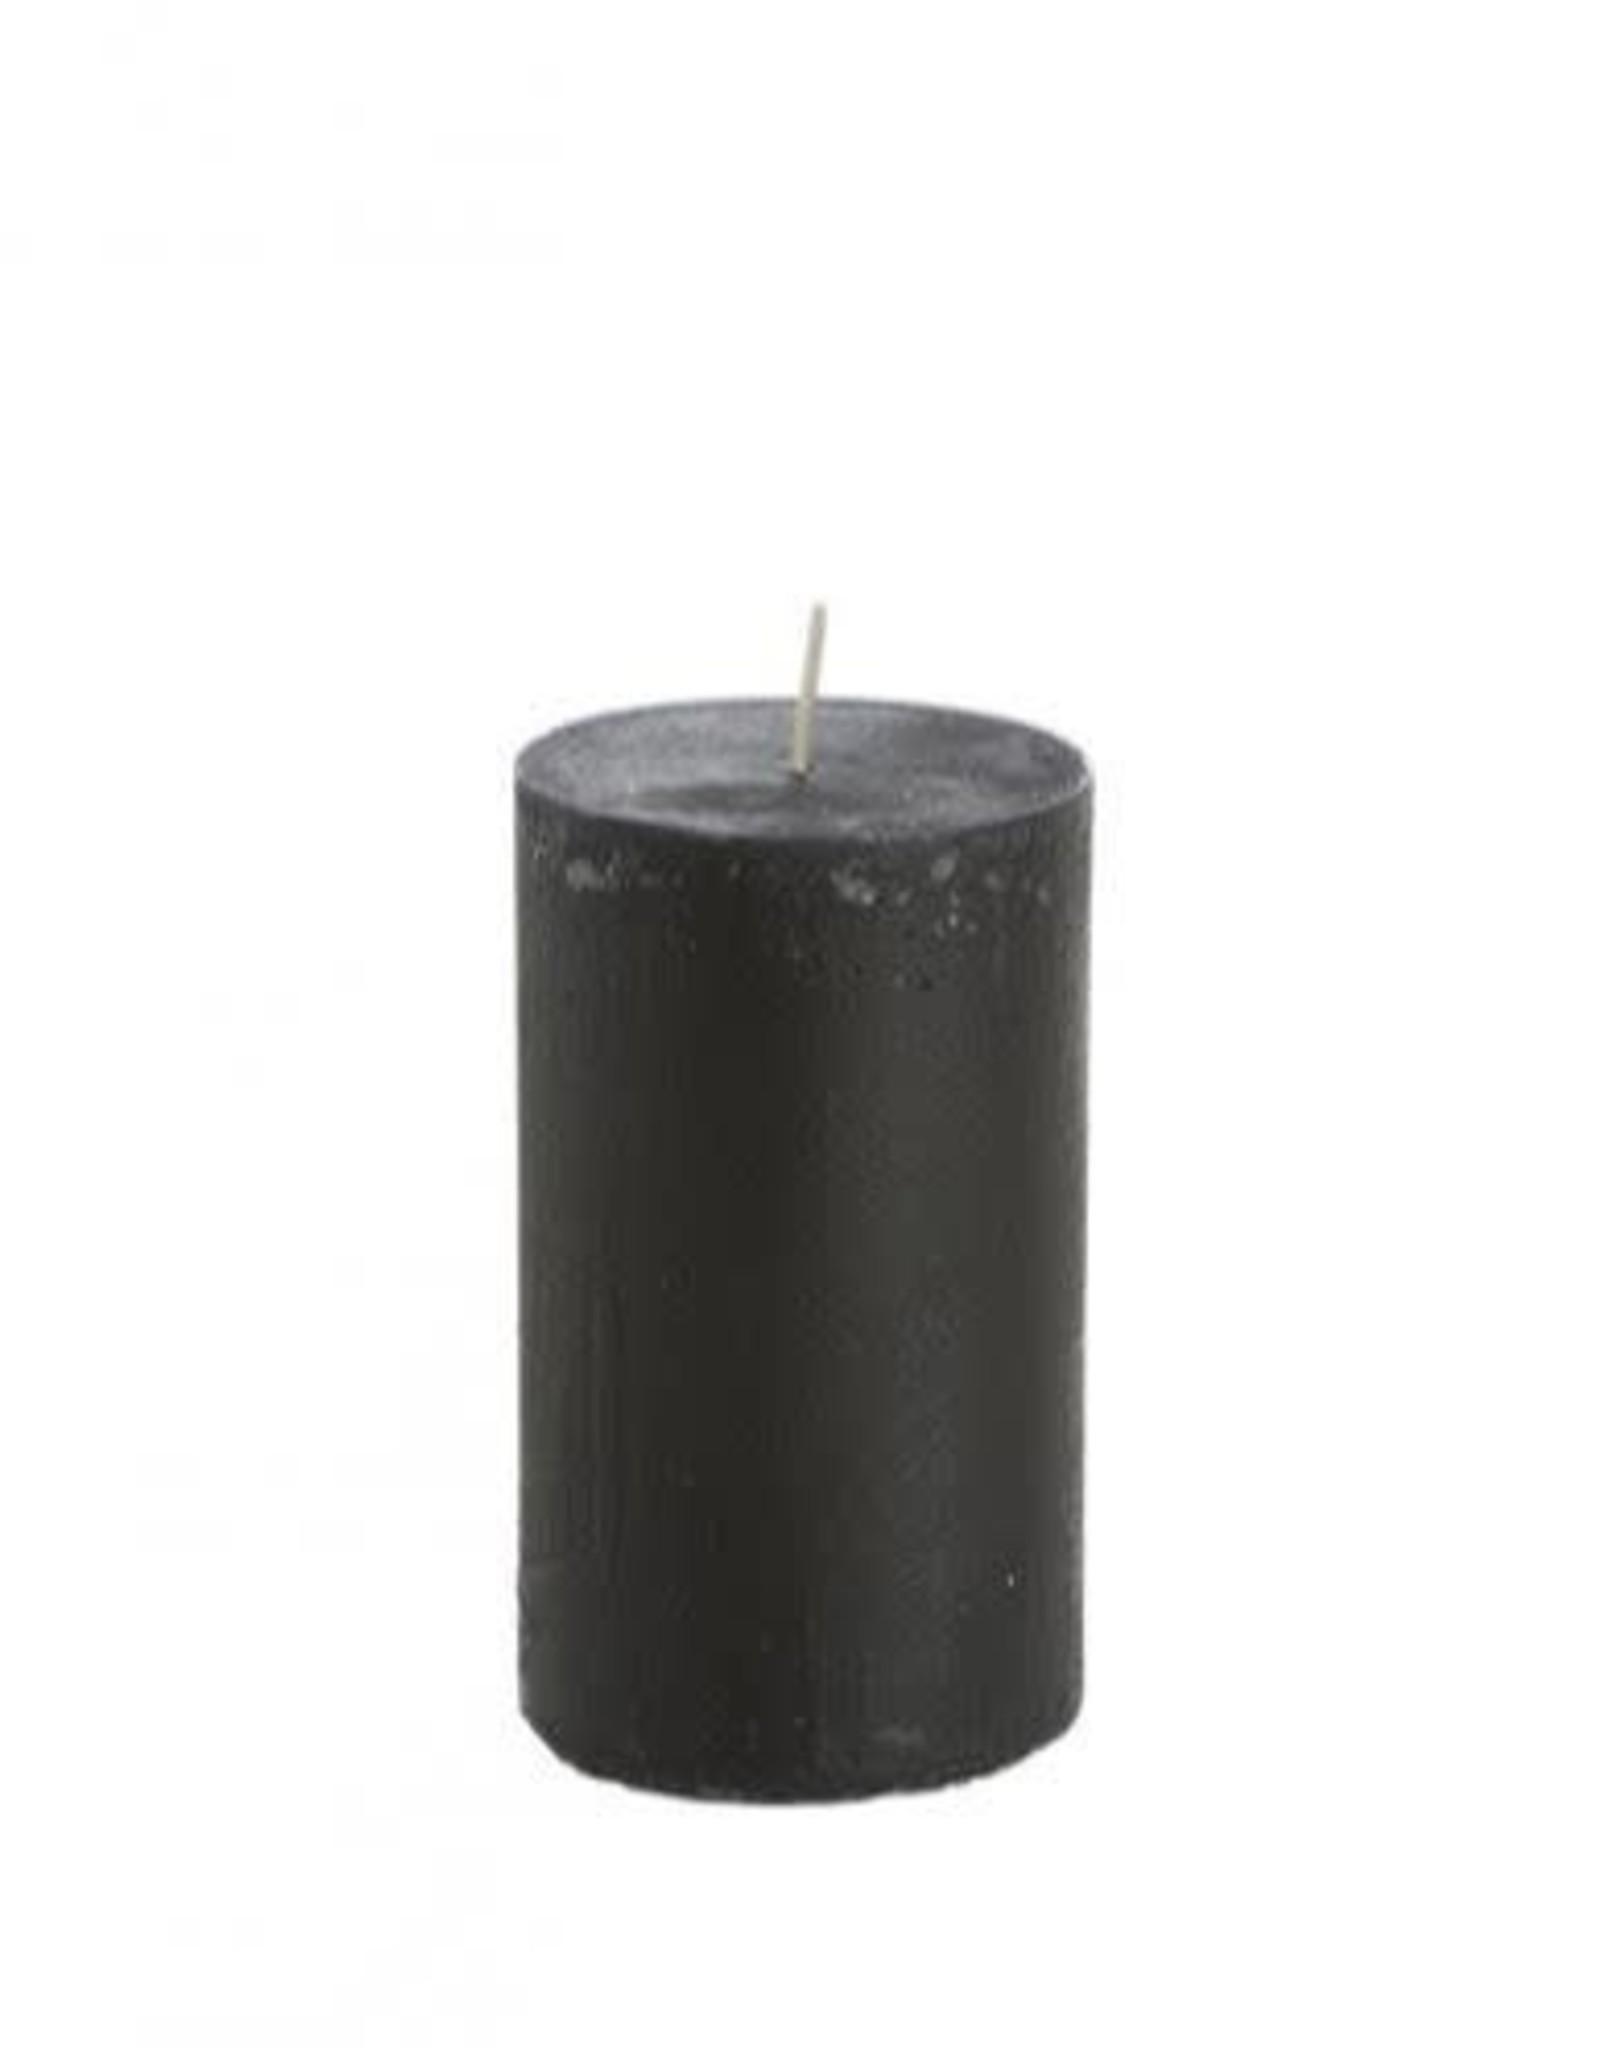 Rustik Lys rustic candle 7 x 13,5cm - black